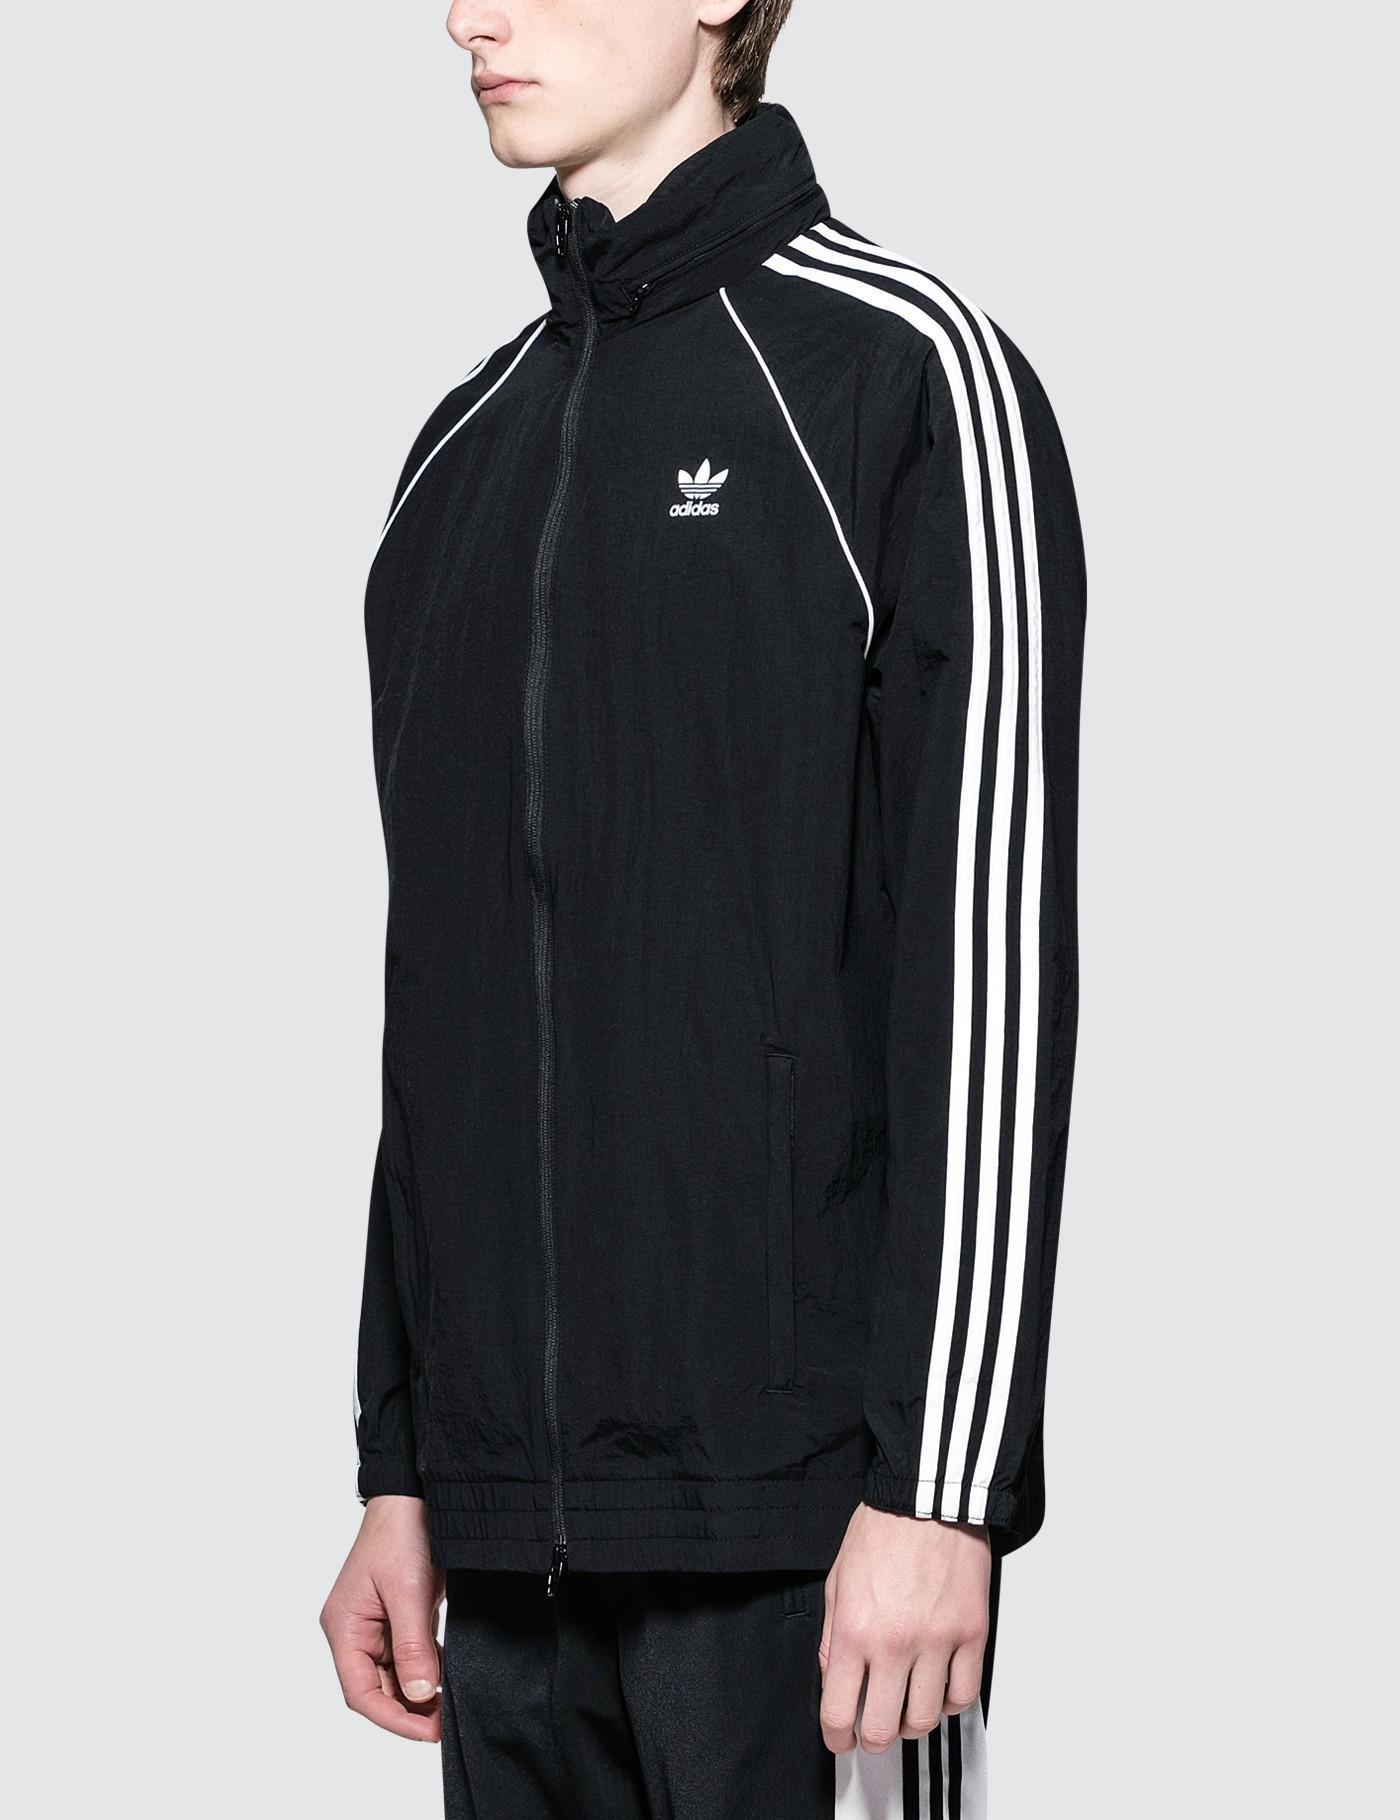 4e08d960d6 adidas Originals Sst Windbreaker Jacket - Mens S in Black for Men - Save  51% - Lyst